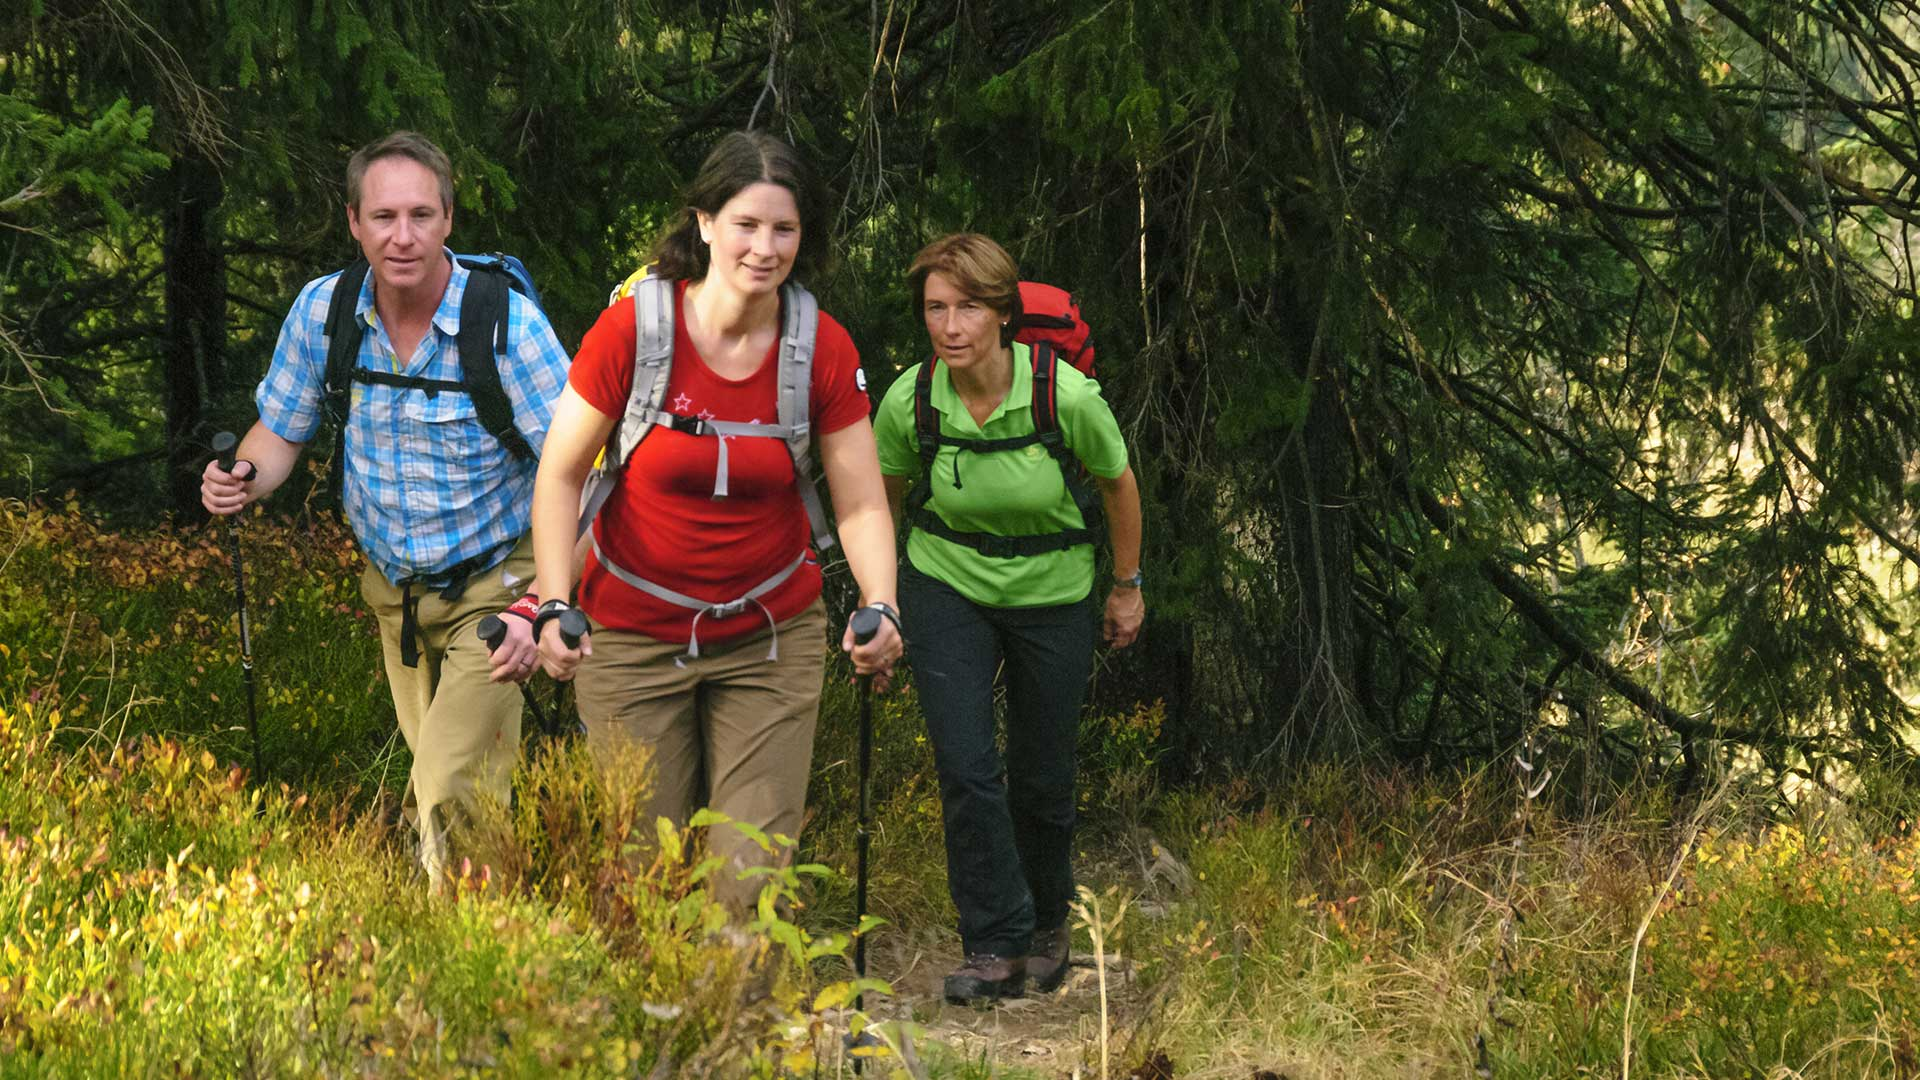 Wandergruppe bei einer Gruppenreise Oberhof | © ARochau - fotolia.com